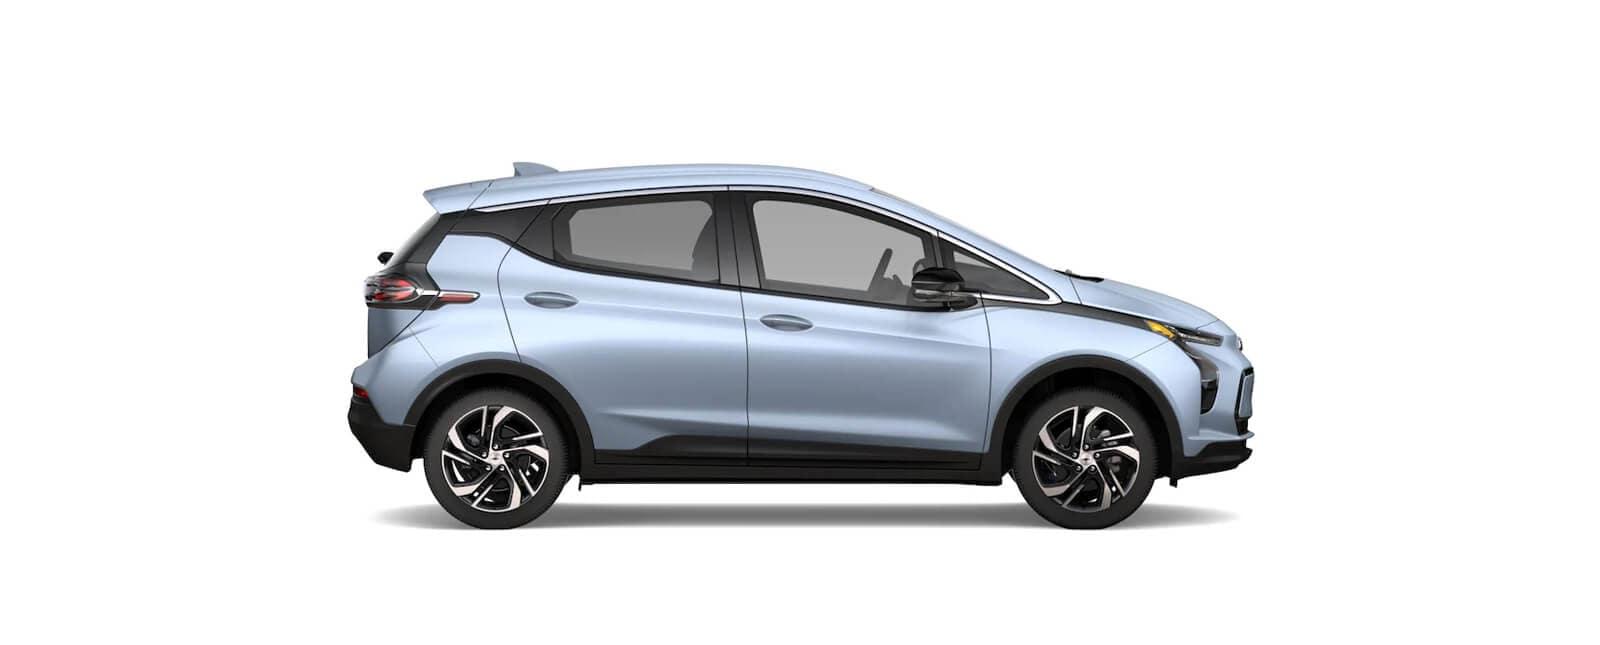 New Chevrolet Vehicles: 2022 Bolt EV